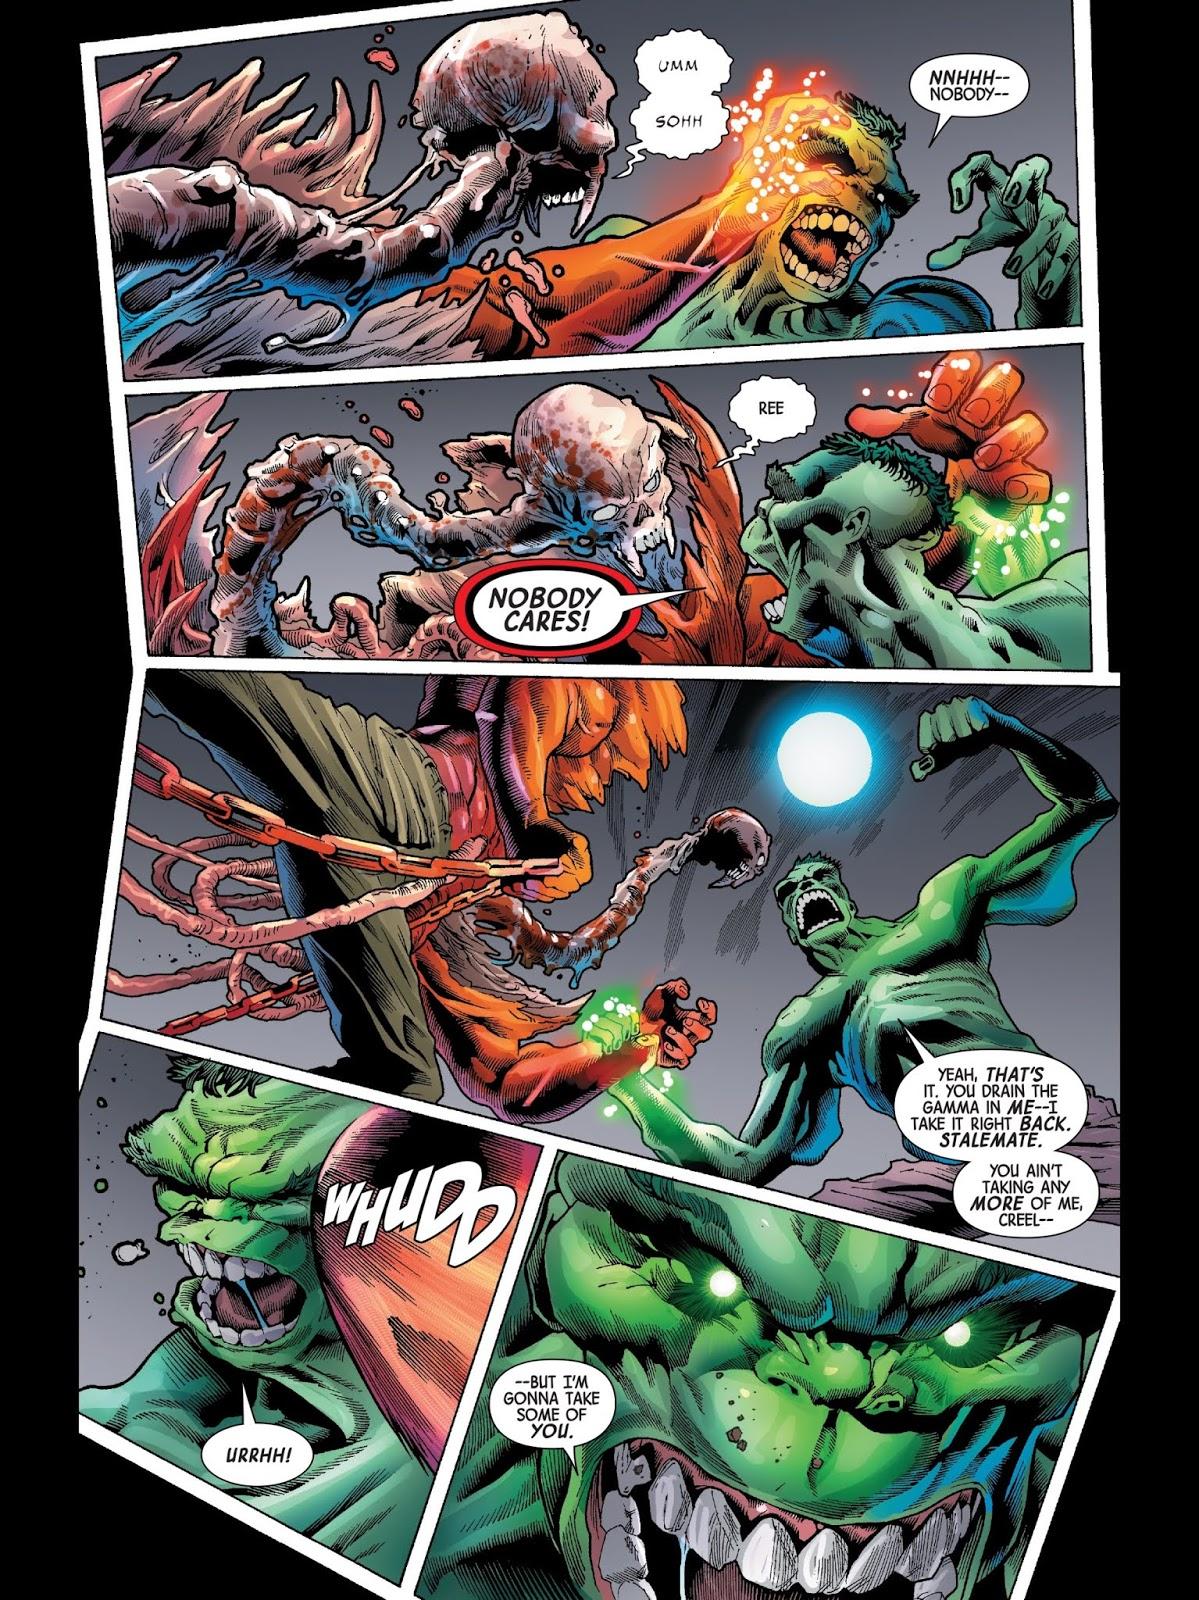 Nerdiest Kid You Know Immortal Hulk 10 See more of pensamento alpha 2 on facebook. nerdiest kid you know immortal hulk 10